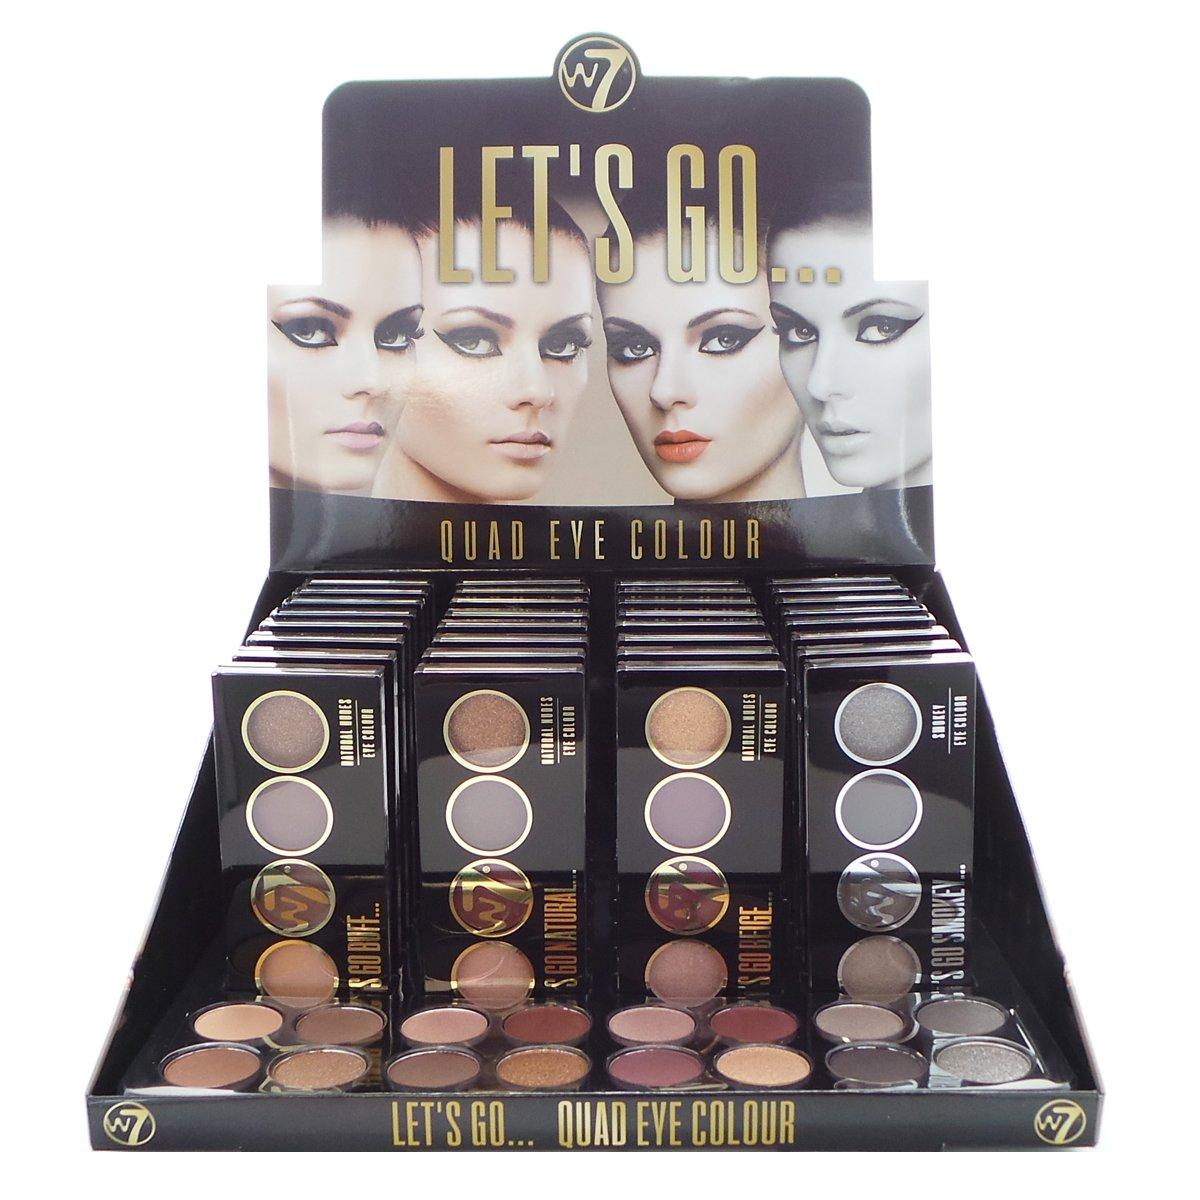 W7 Let's Go Quad Eye Color Display Set, 32 Pieces Plus Display Testers (並行輸入品) B0767G2PS5